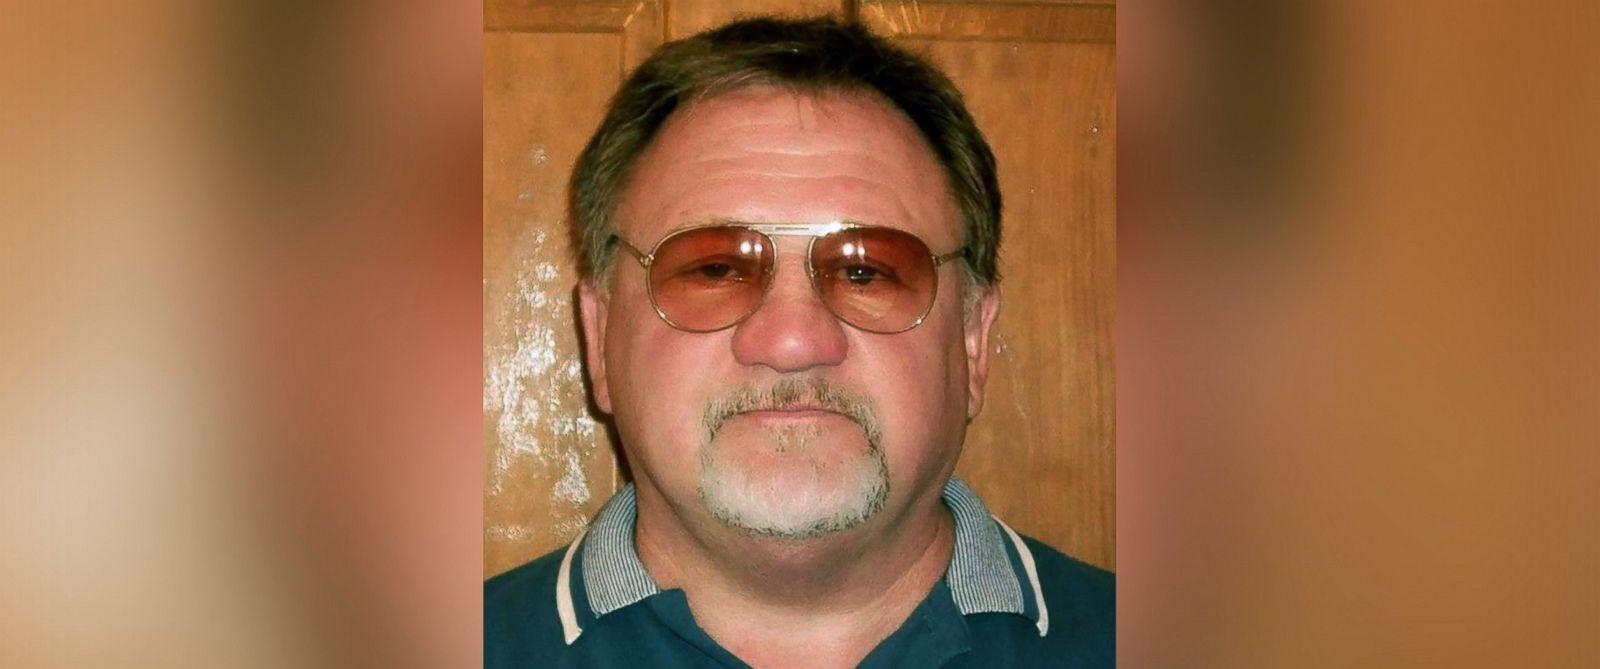 PHOTO: James T. Hodgkinson, suspect in the shooting of congressman at a baseball game in Alexandria, Va.